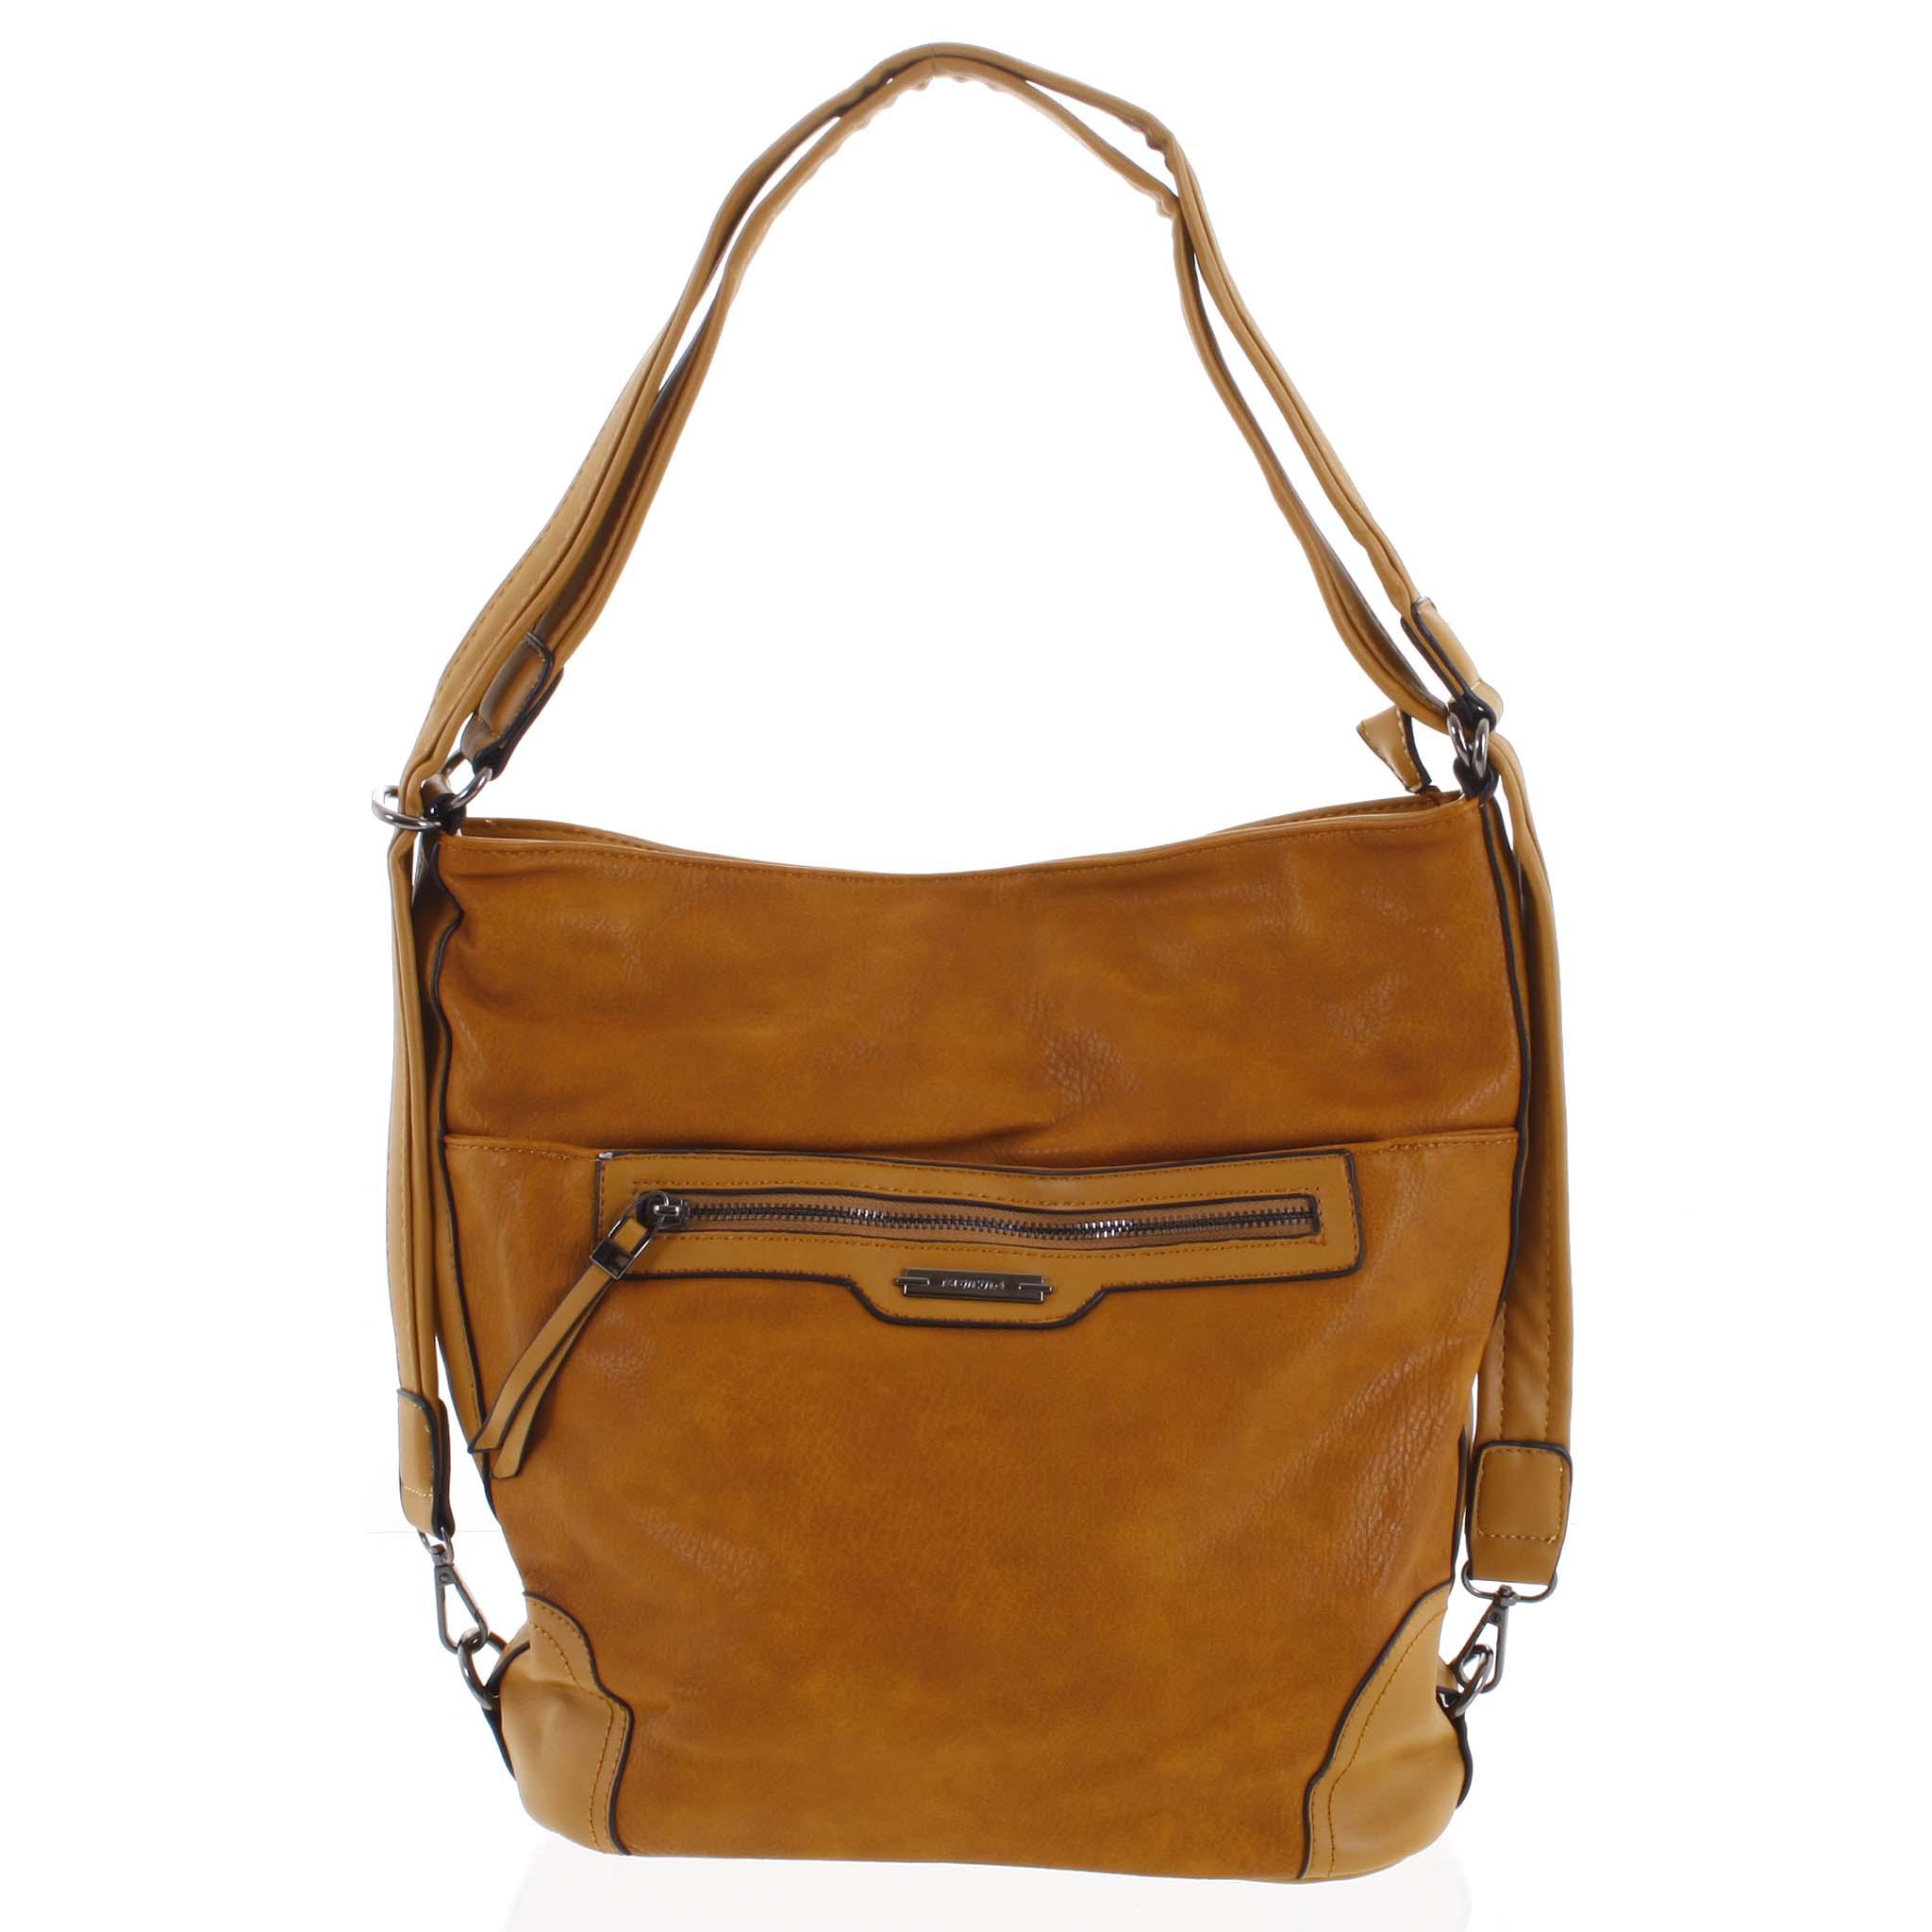 Dámská kabelka batoh tmavě žlutá - Romina Zilla